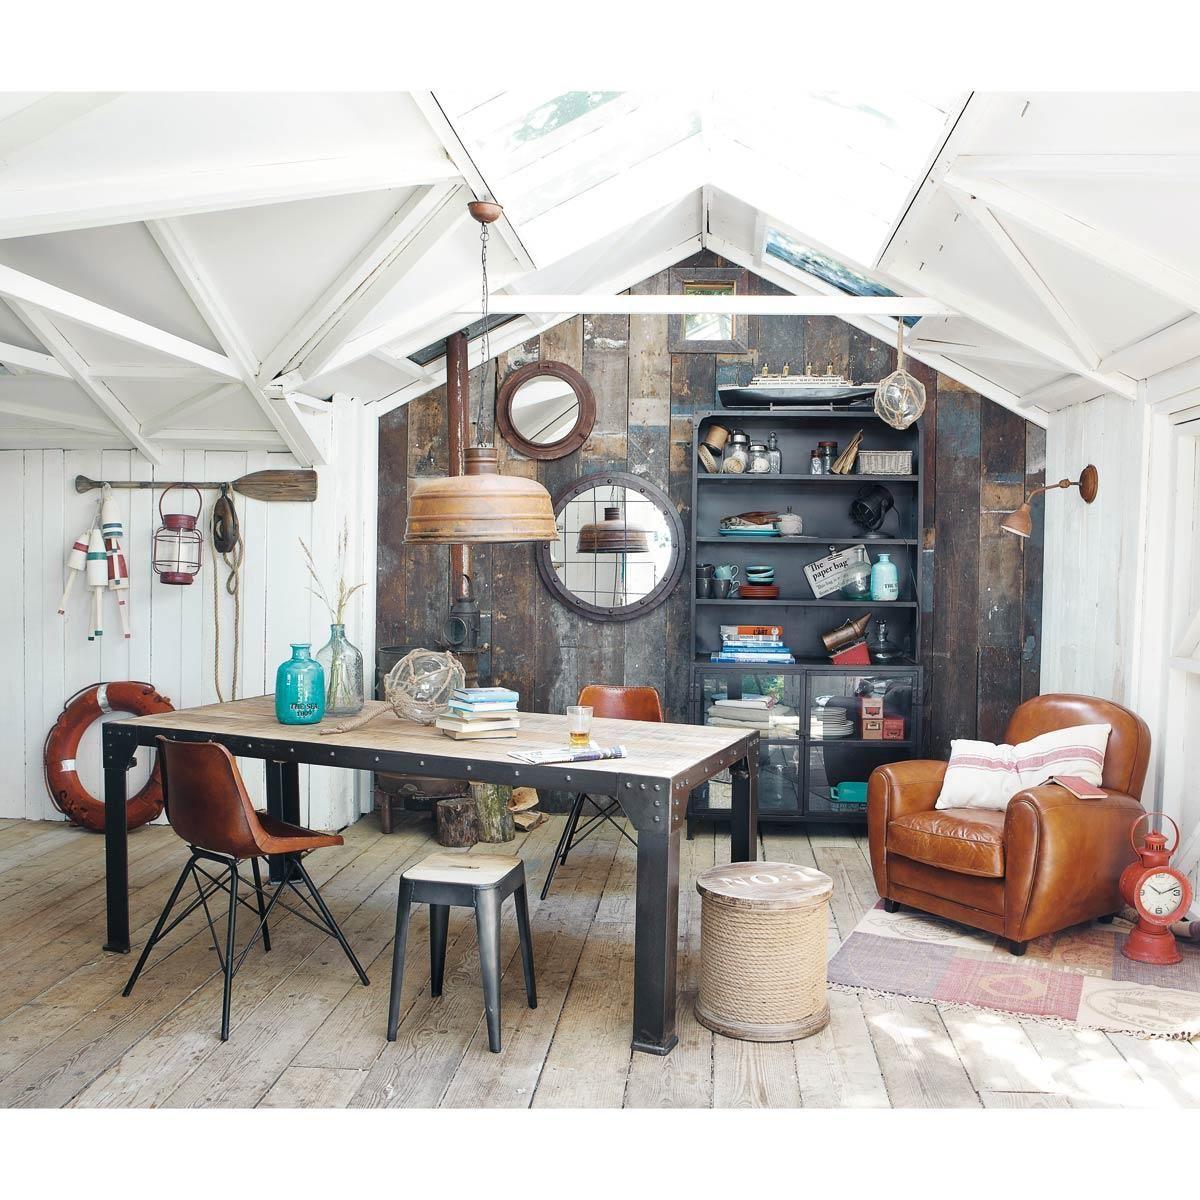 tabouret bobine de corde bord de mer pinterest. Black Bedroom Furniture Sets. Home Design Ideas